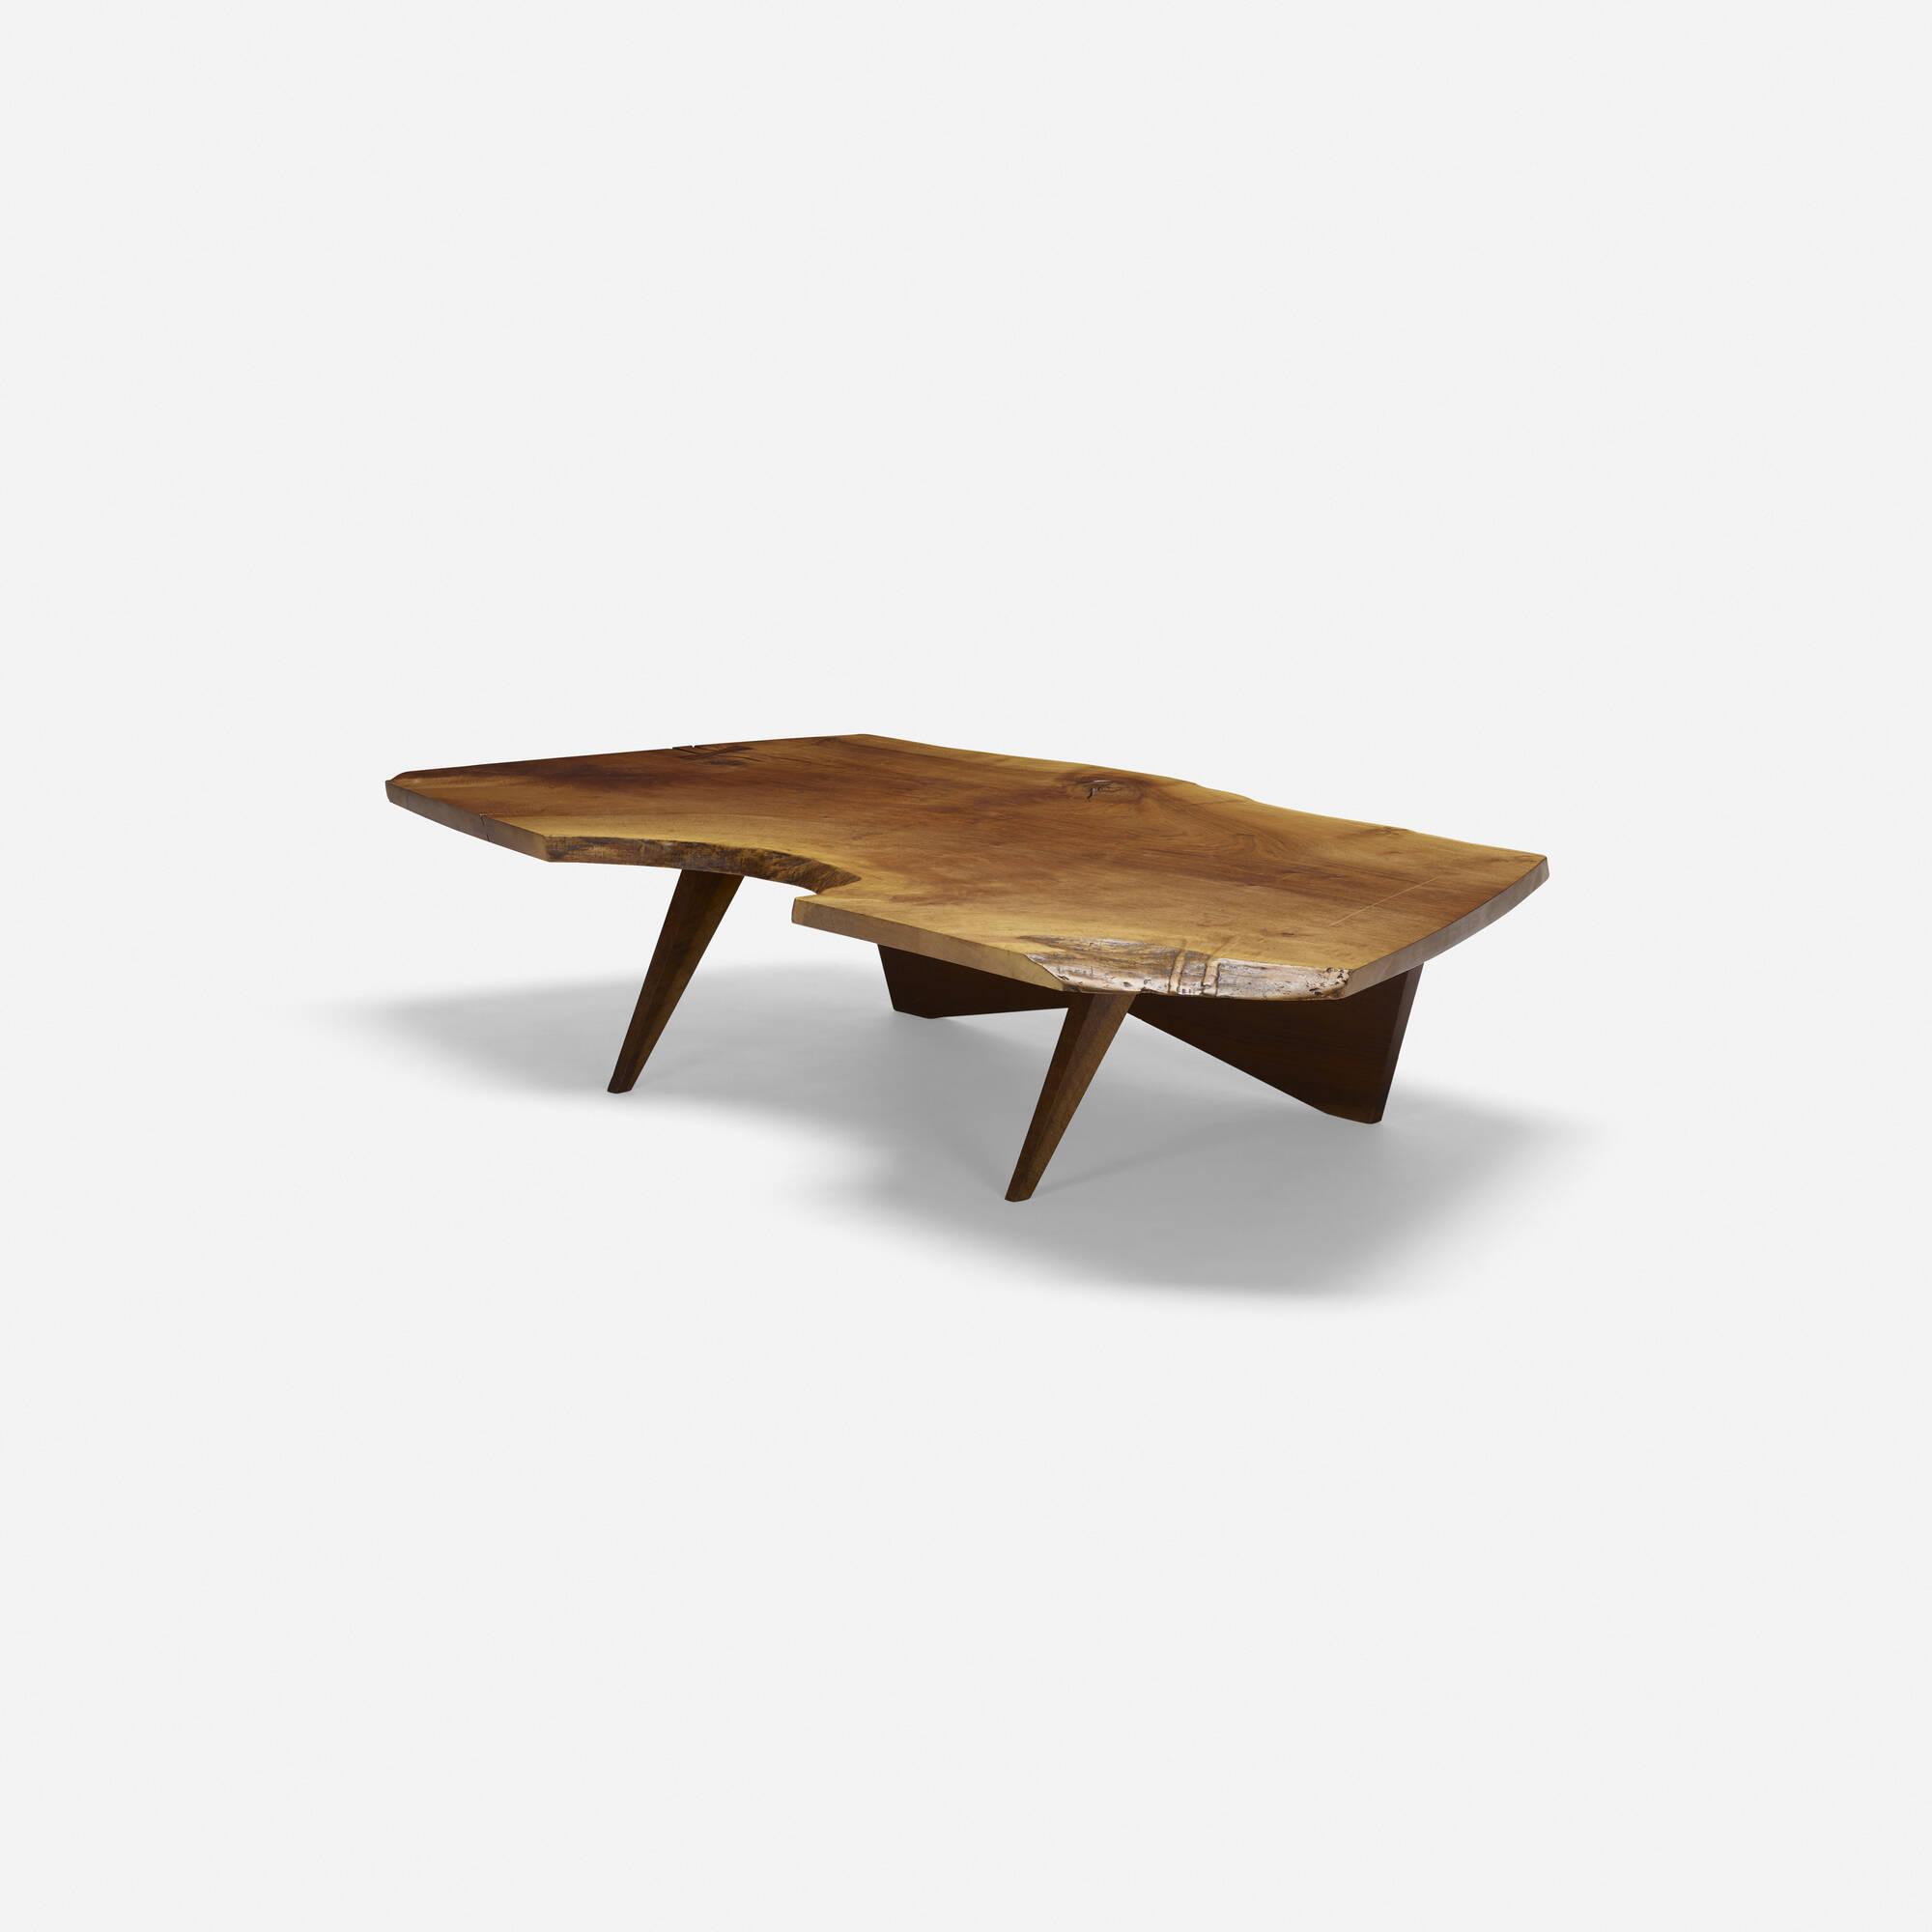 121 george nakashima slab coffee table design 23 march 2017